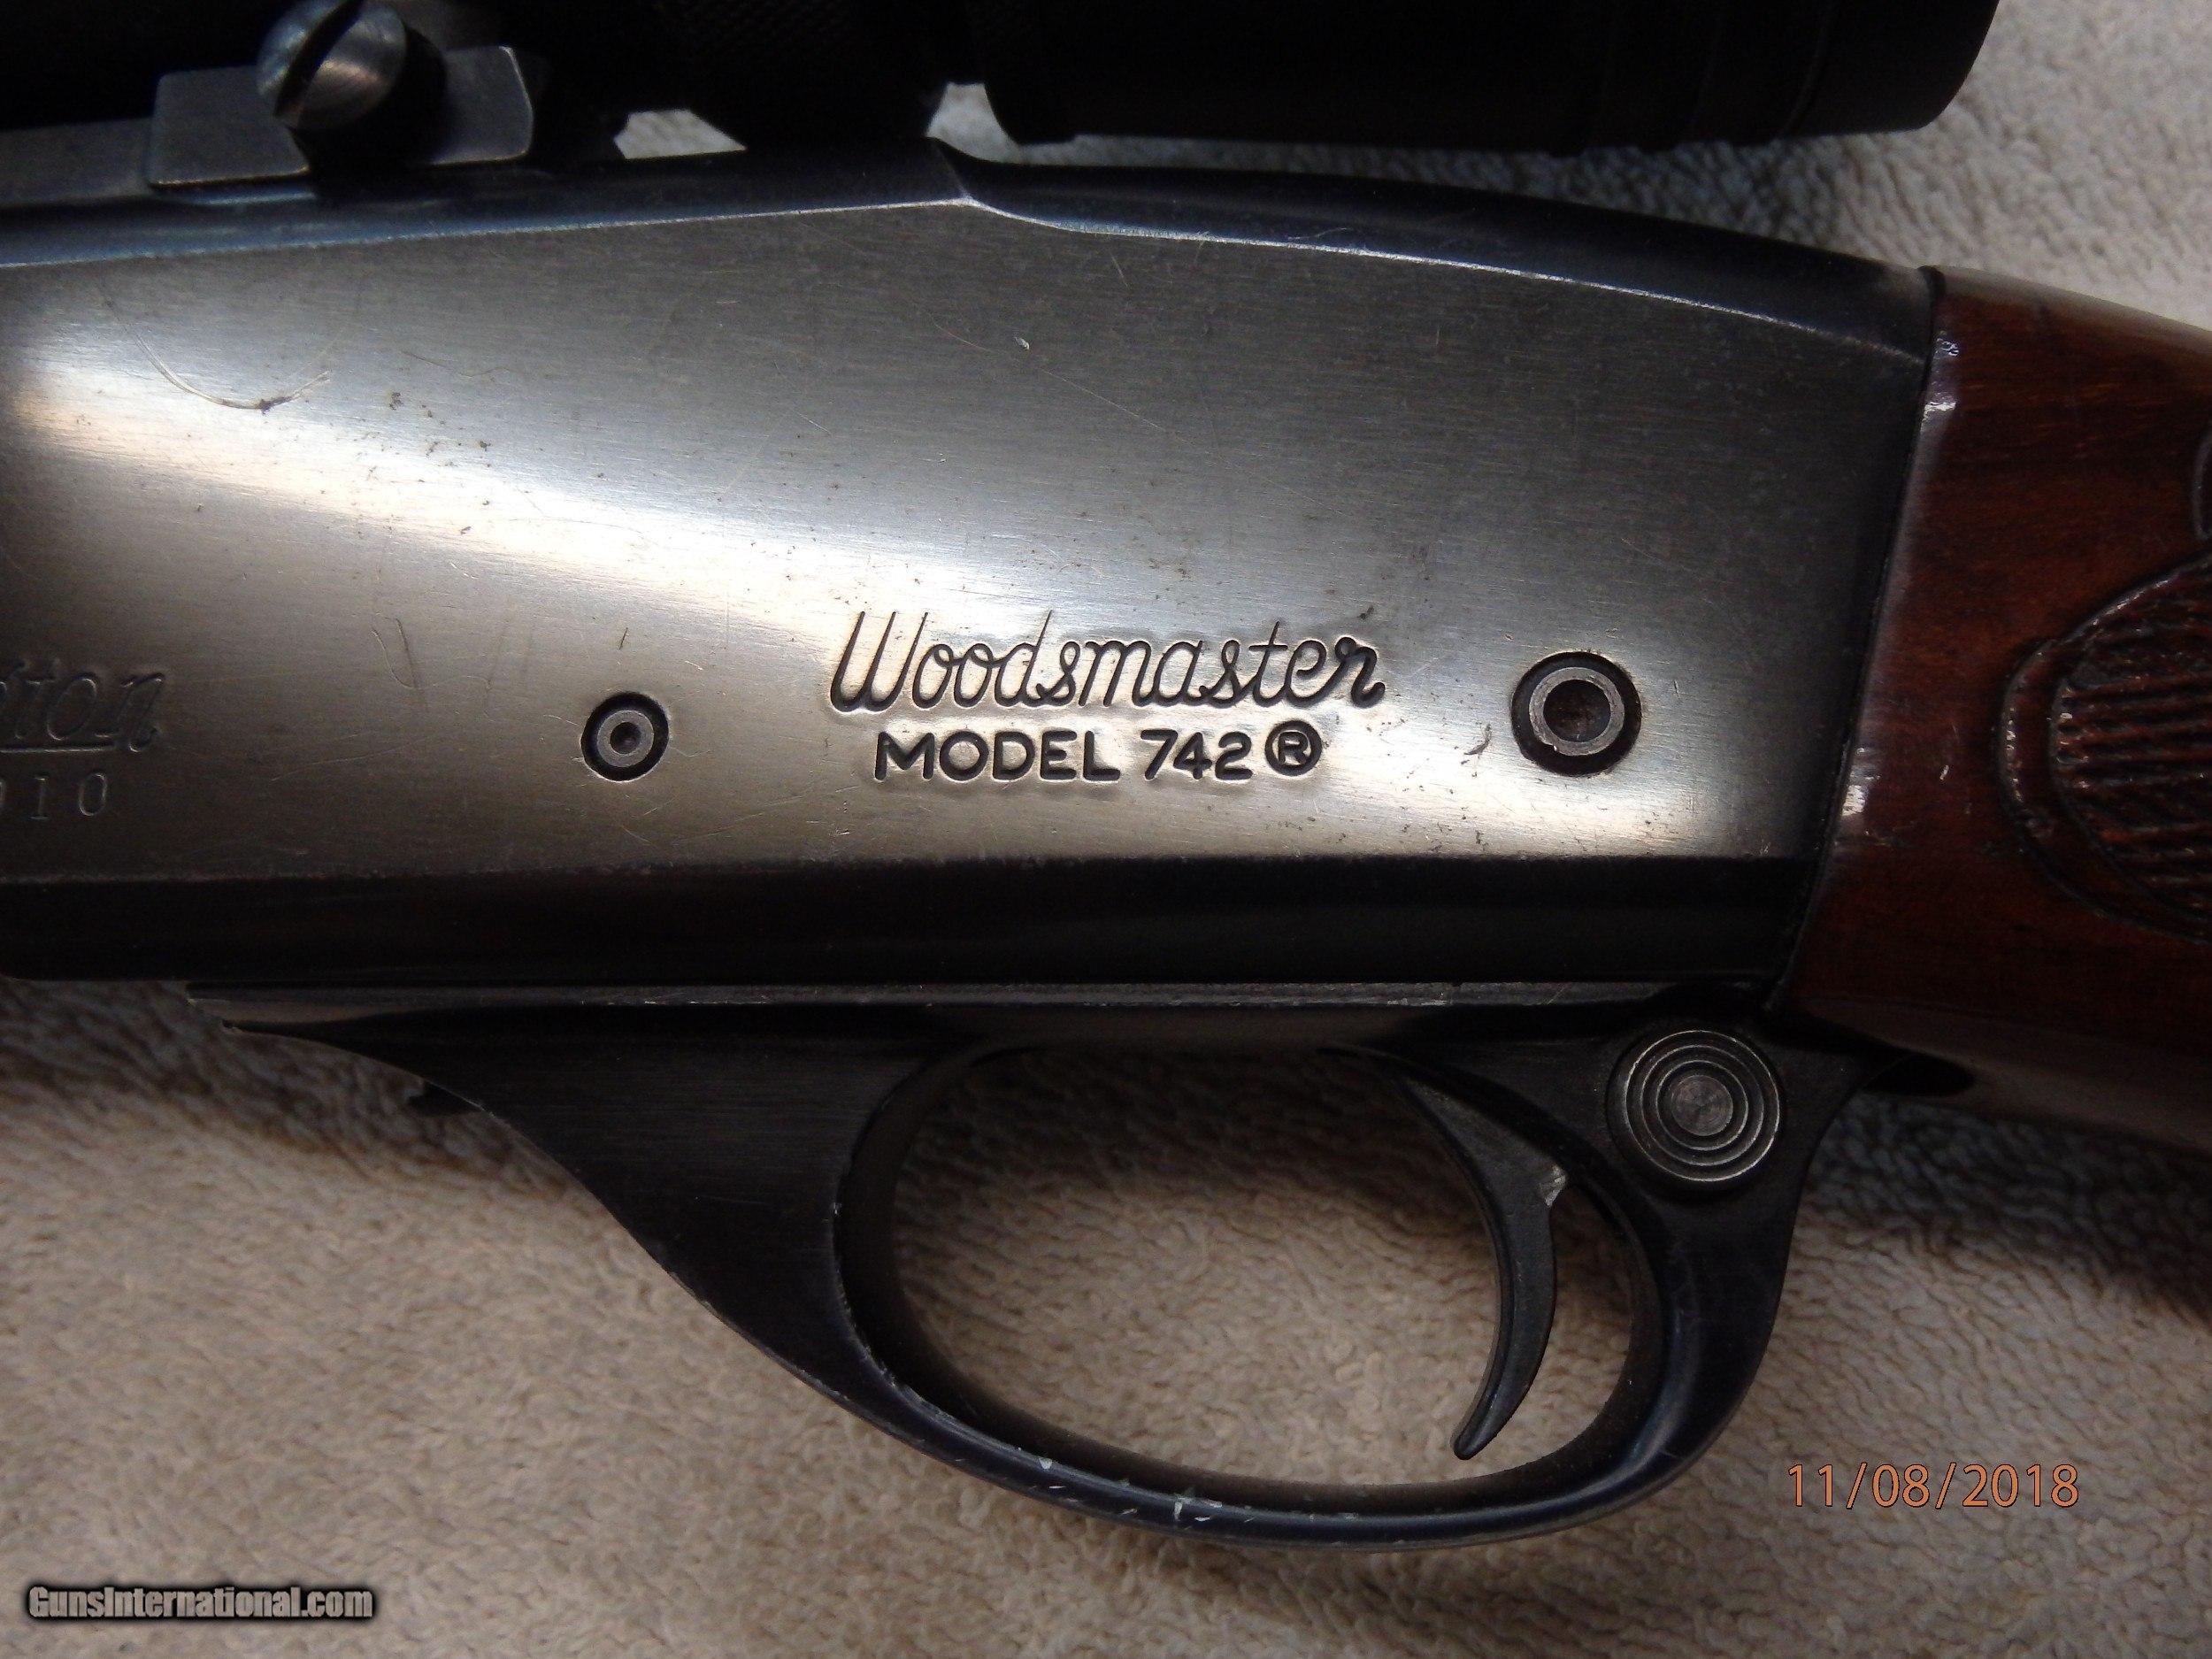 100+ Remington 742 Woodsmaster Serial Numbers – yasminroohi